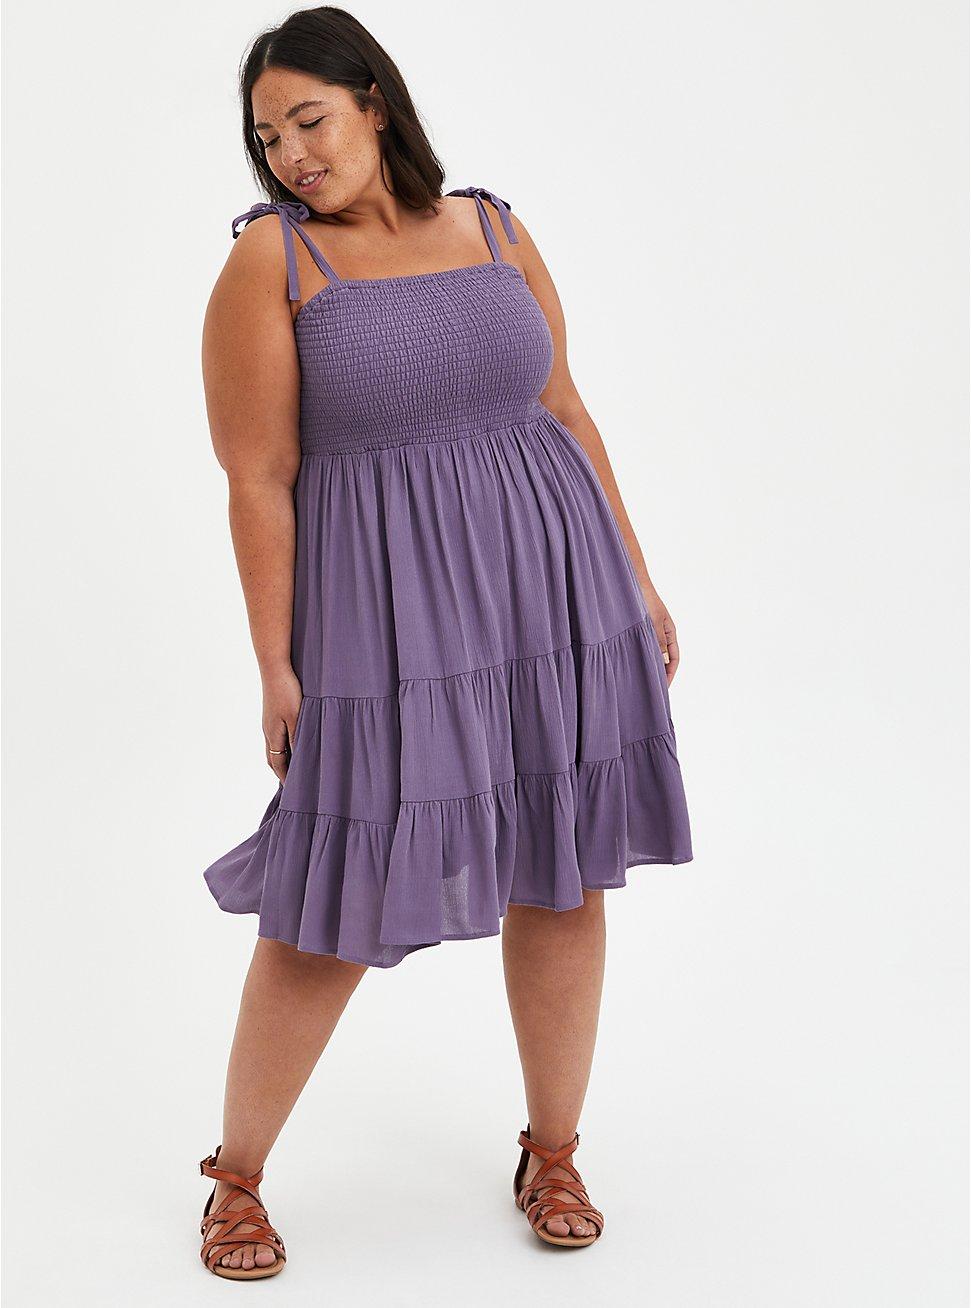 Smocked Tiered Skater Dress - Gauze Purple, PURPLE, hi-res